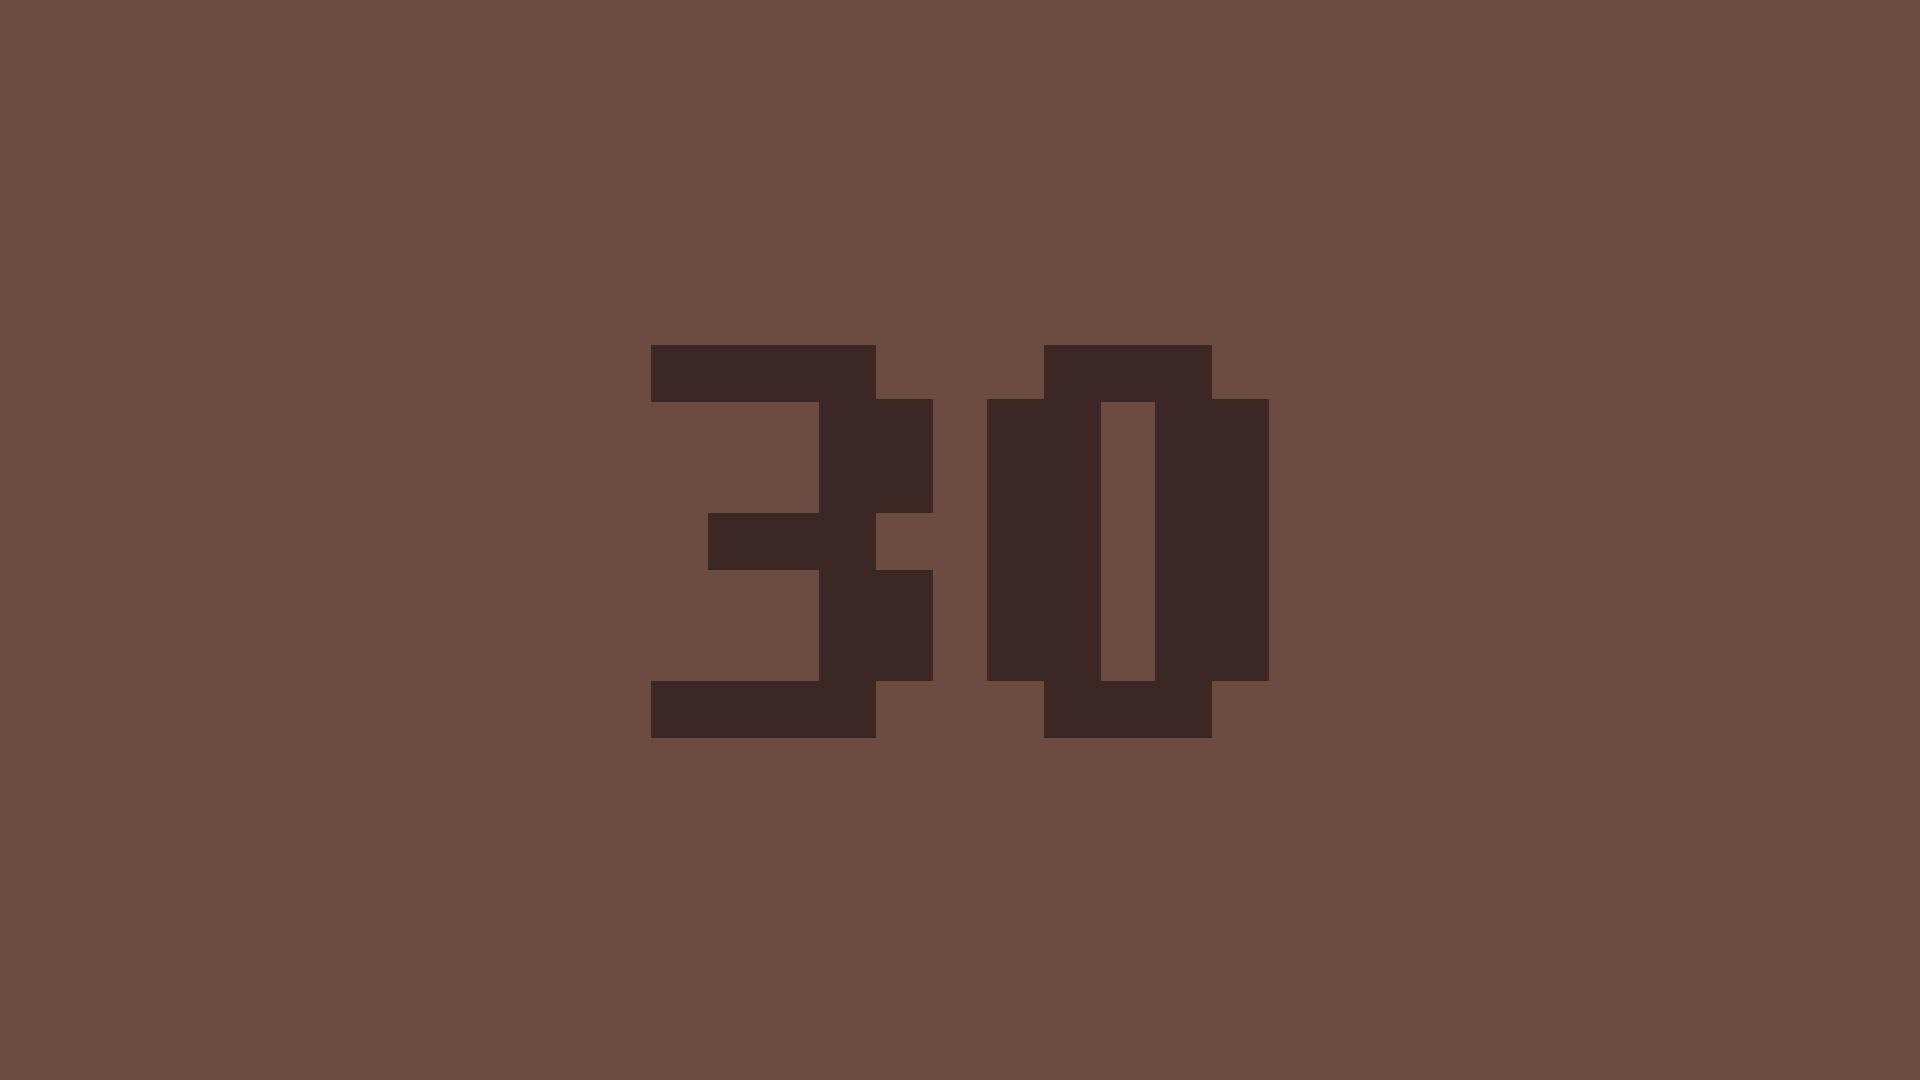 Level 30!